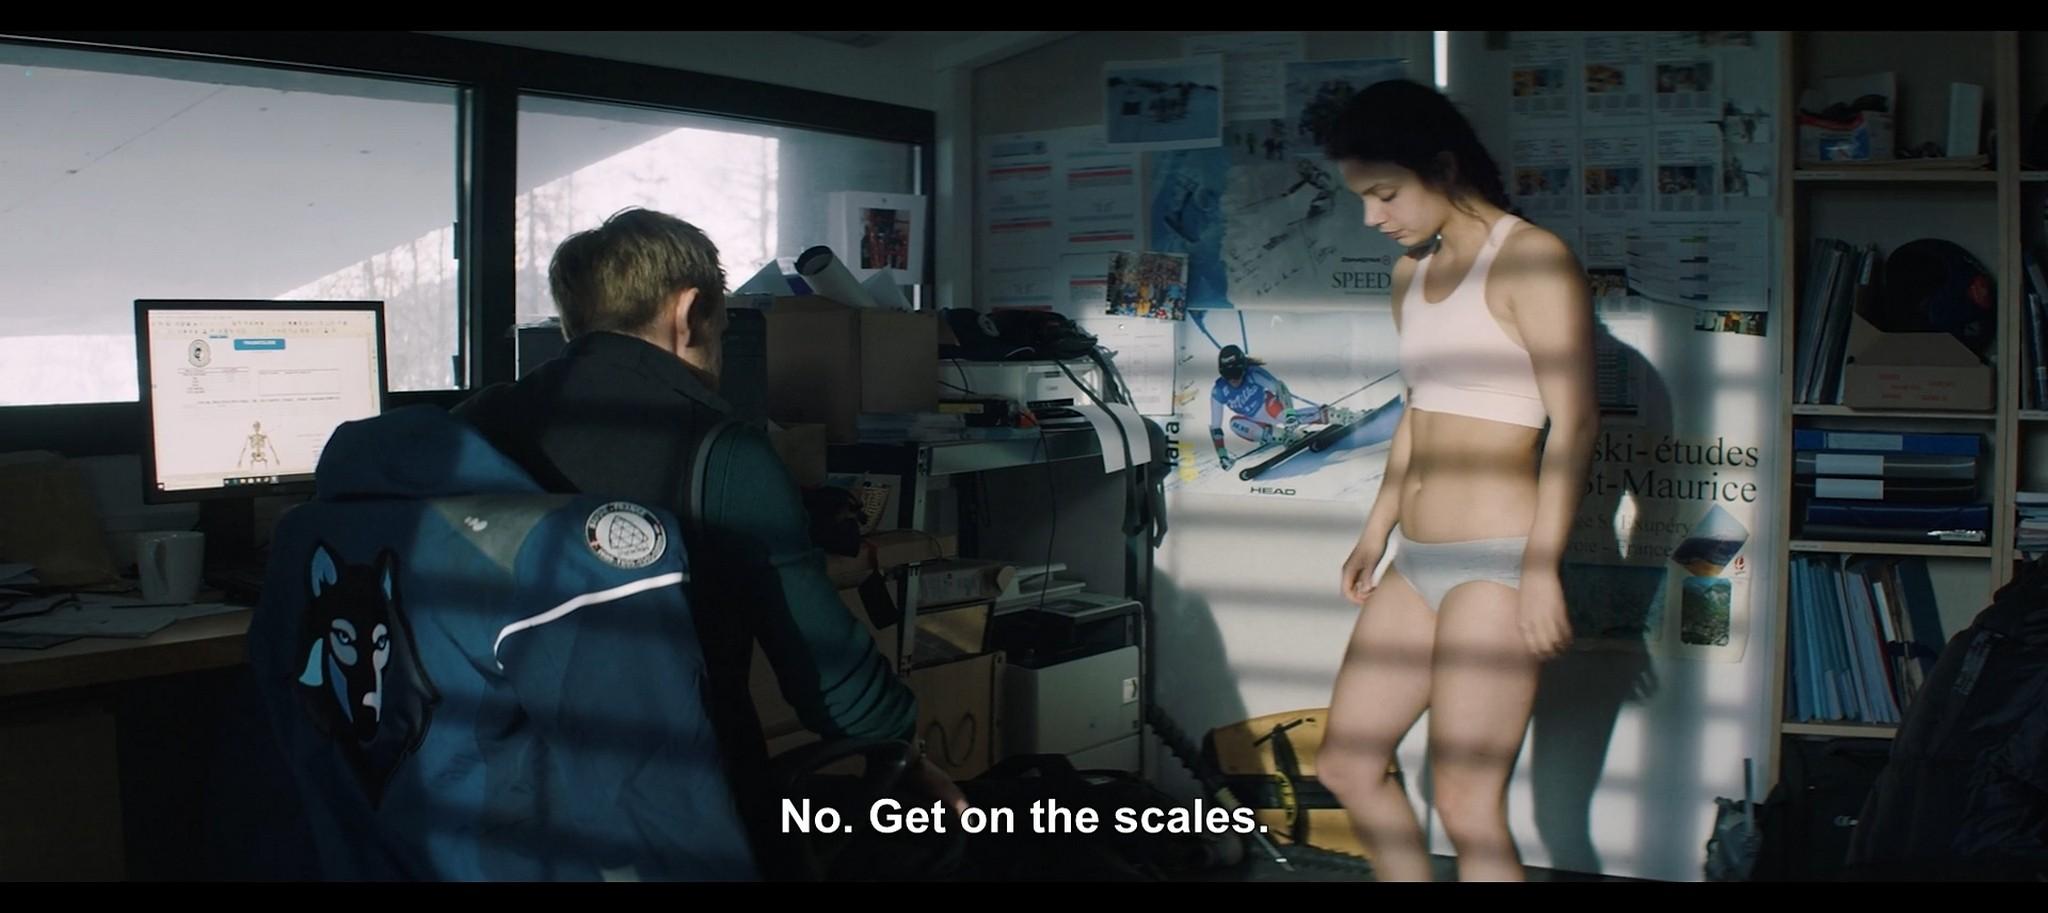 Noee Abita nude sex Maira Schmitt topless Slalom 2020 1080p Web 2